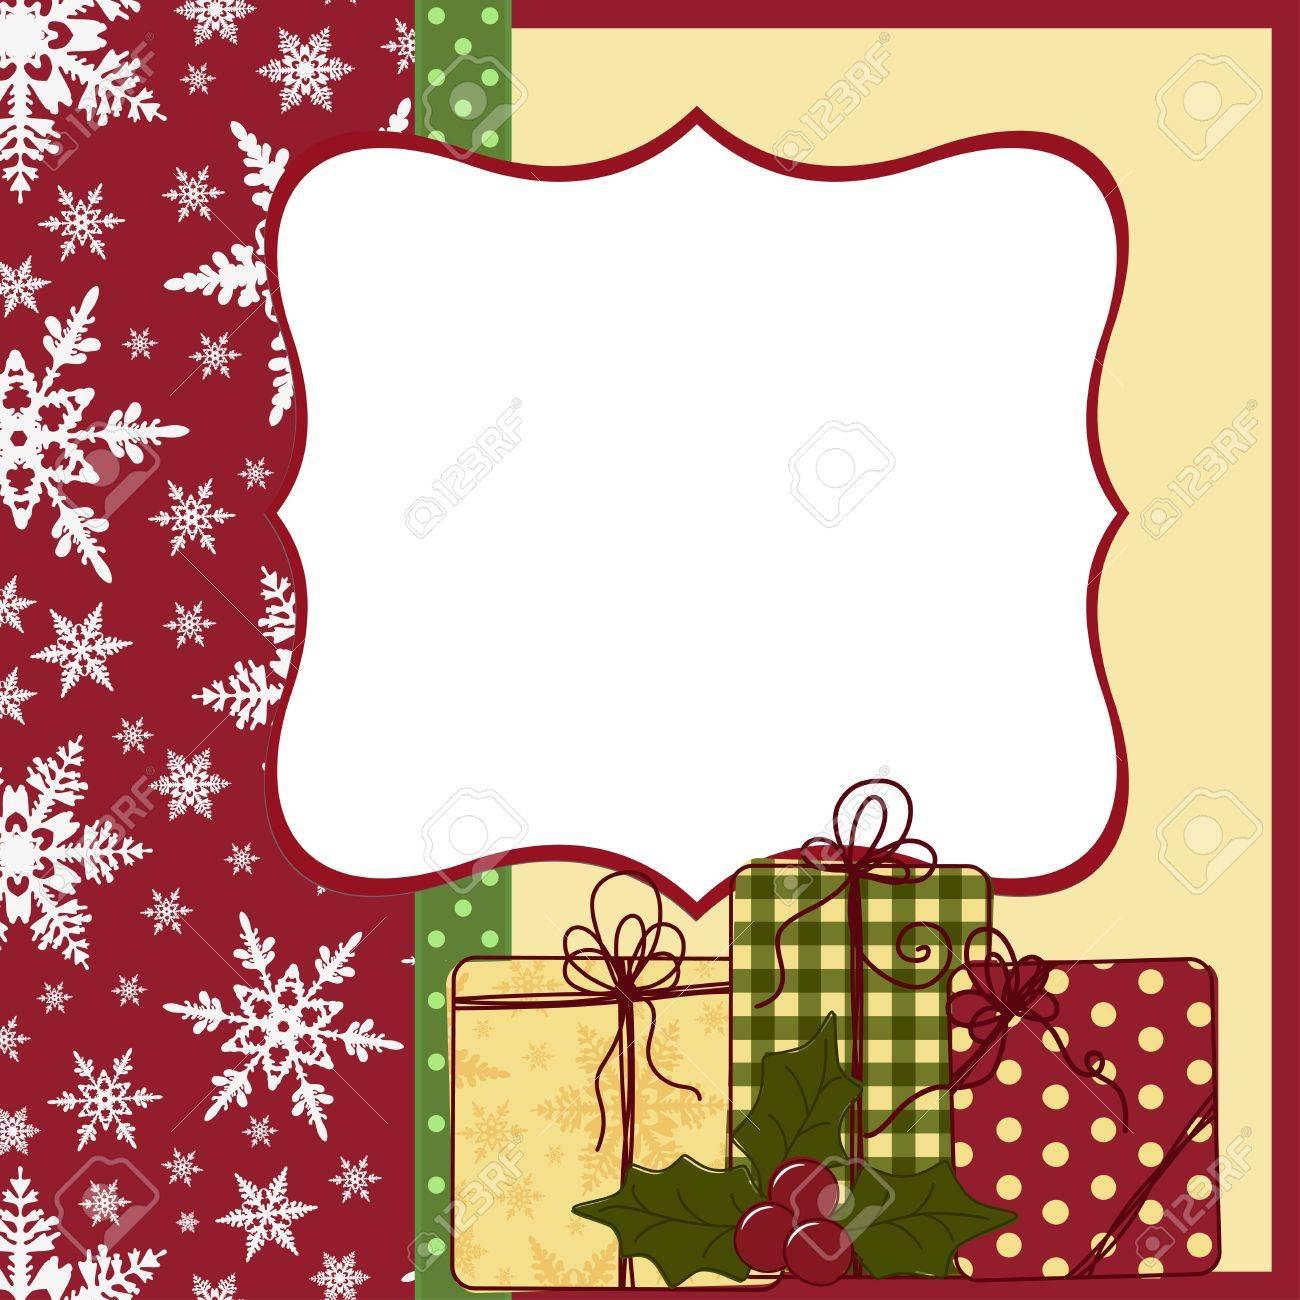 Cute Christmas Postcard Template Royalty Free Cliparts Vectors And - Christmas postcard template